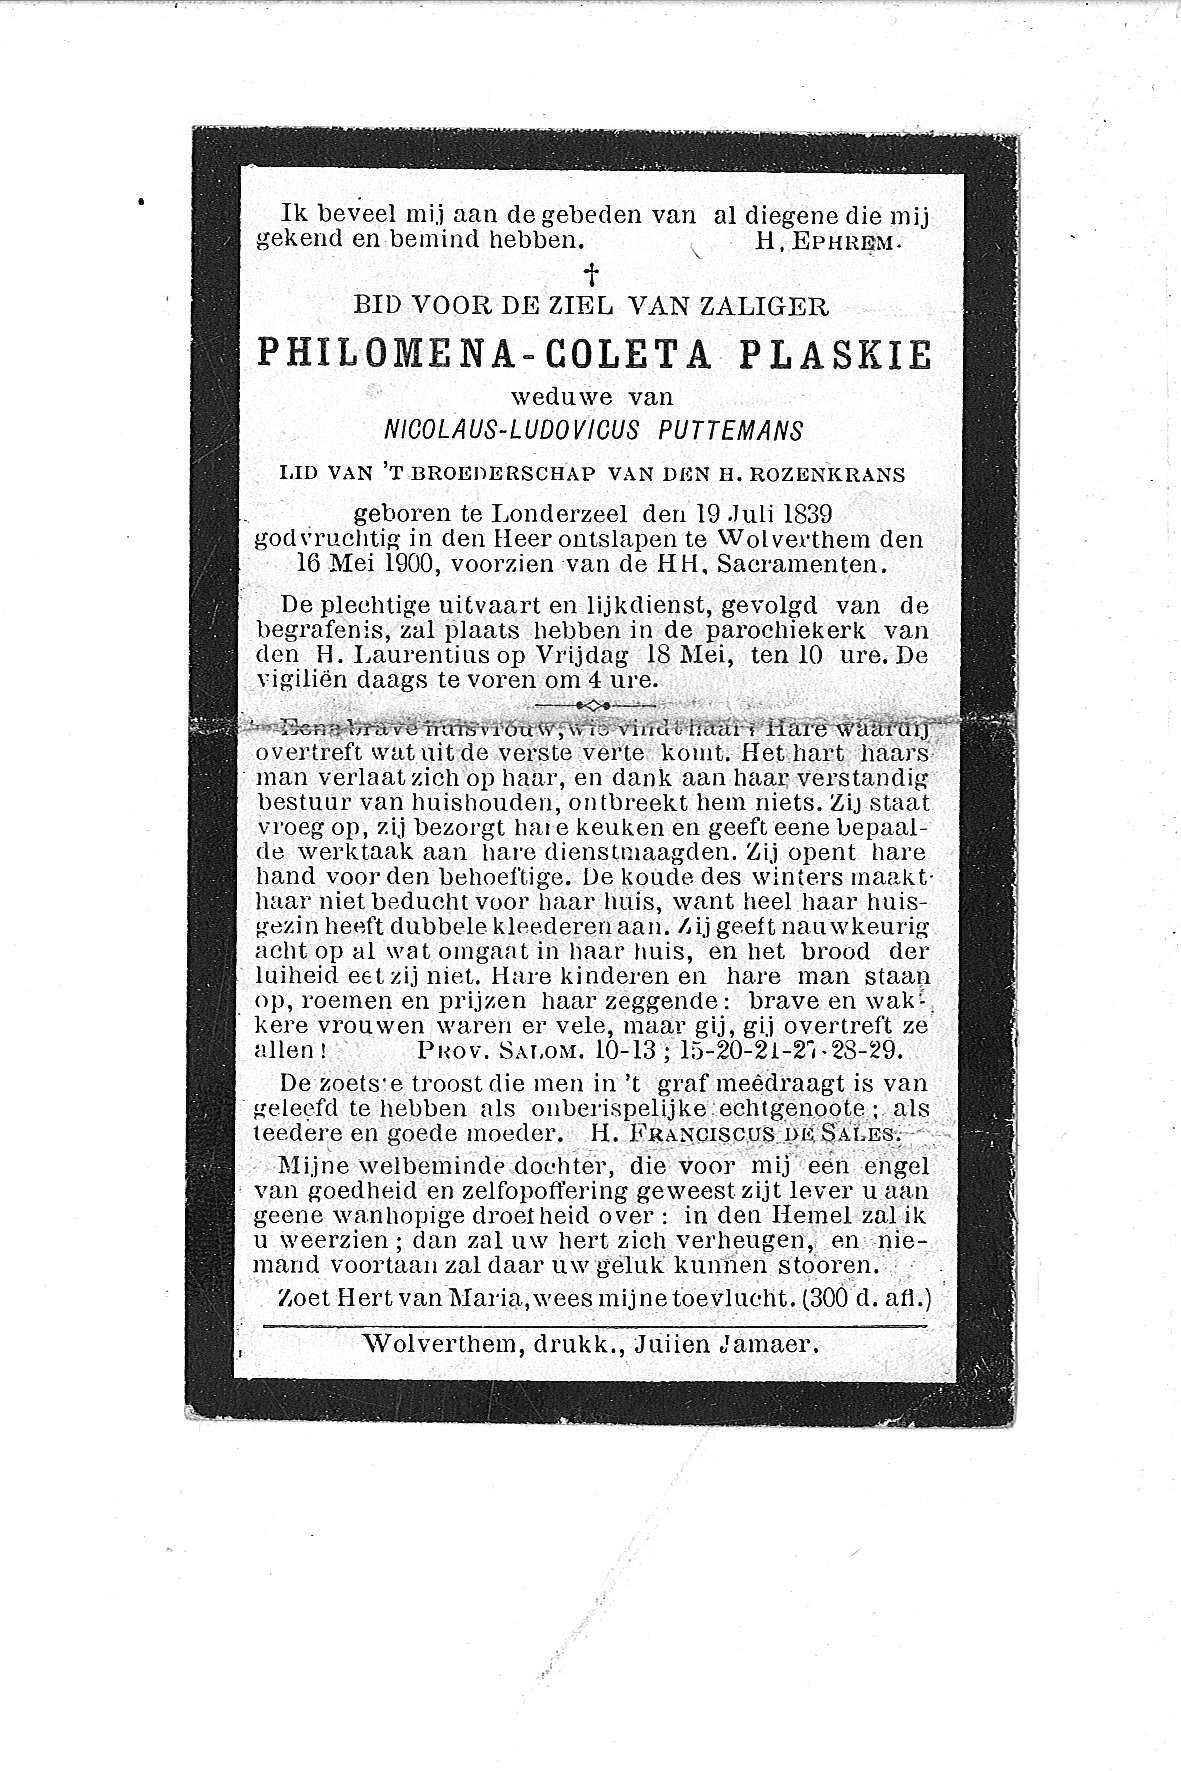 Philomene-Coleta(1900)20100415131555_00006.jpg